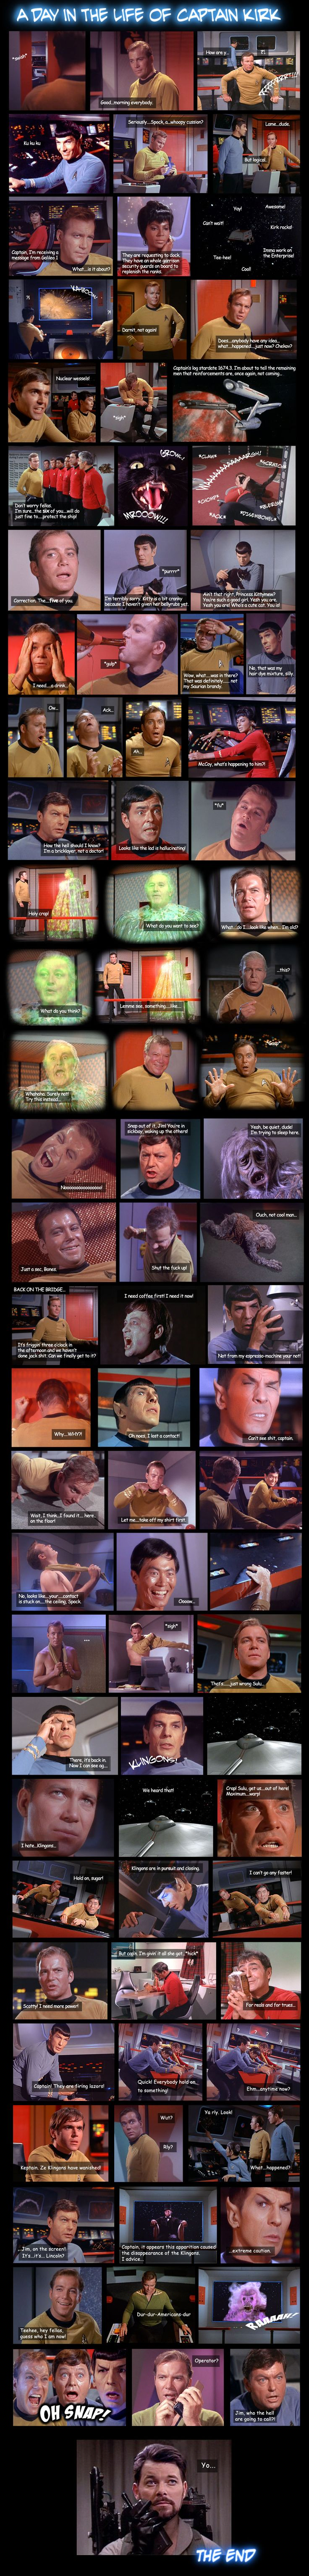 Star Trek: The Original Series by ~Walker82 on deviantART. Super funny!